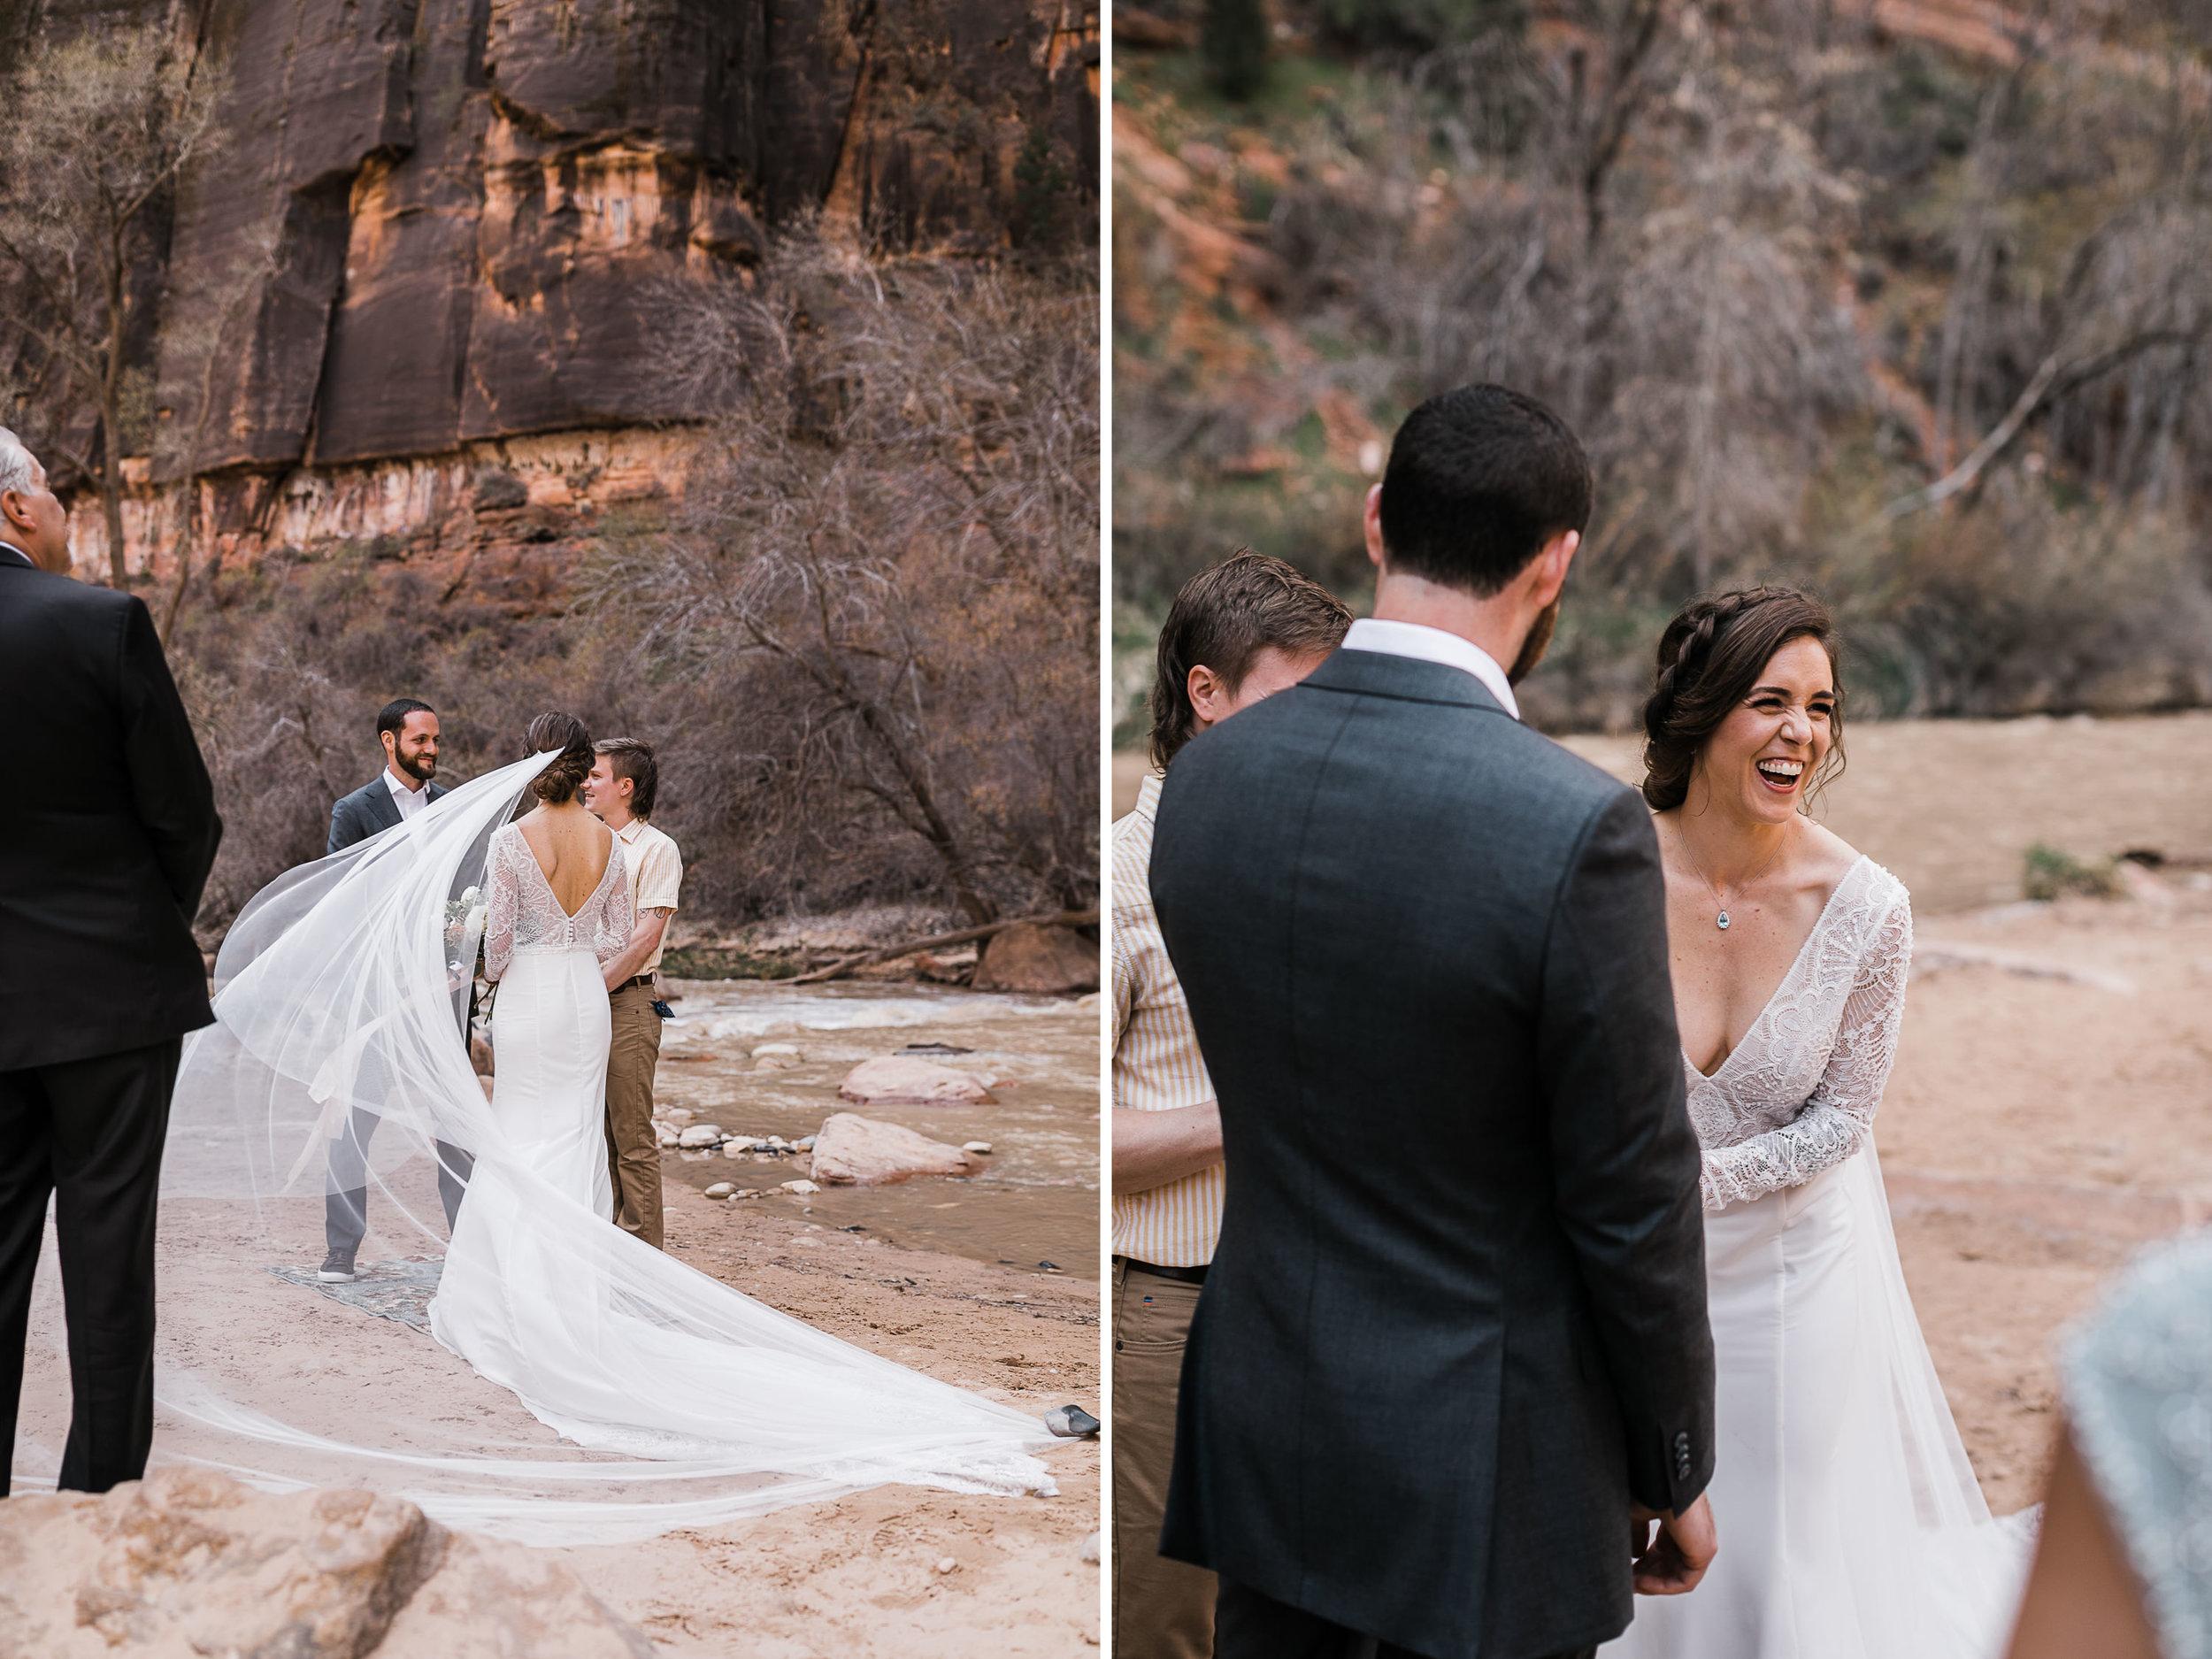 Zion-National-Park-Adventure-Wedding-Hearnes-Elopement-Photography-8.jpg